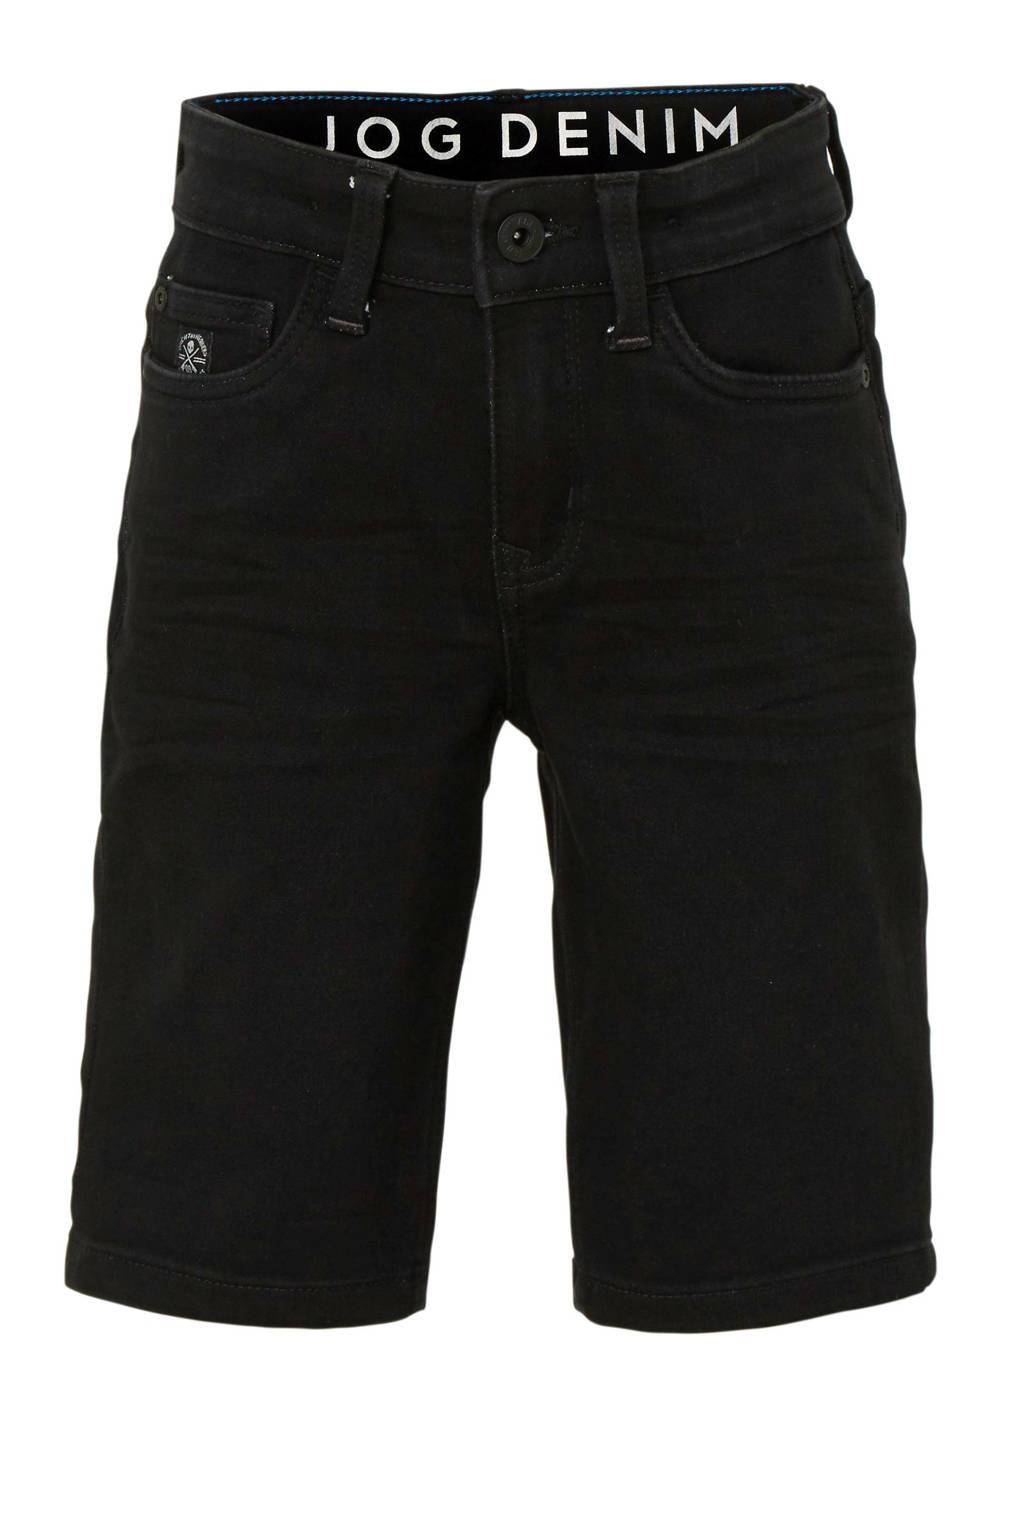 C&A The Denim straight fit jeans bermuda, Zwart